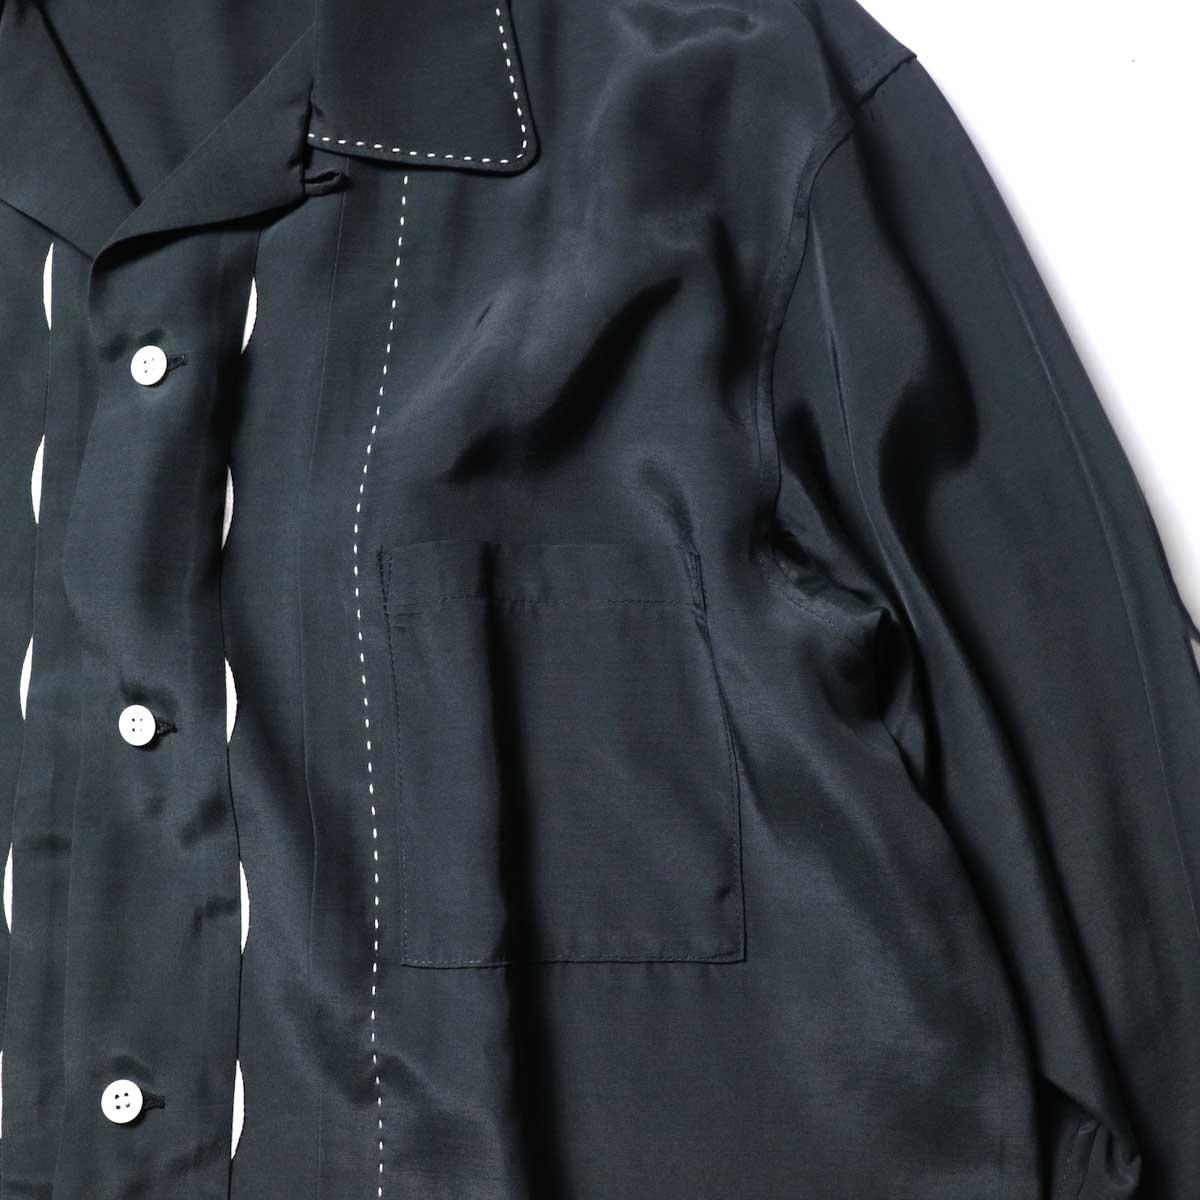 UNUSED / US1974 Rayon Shirt. (Black)装飾